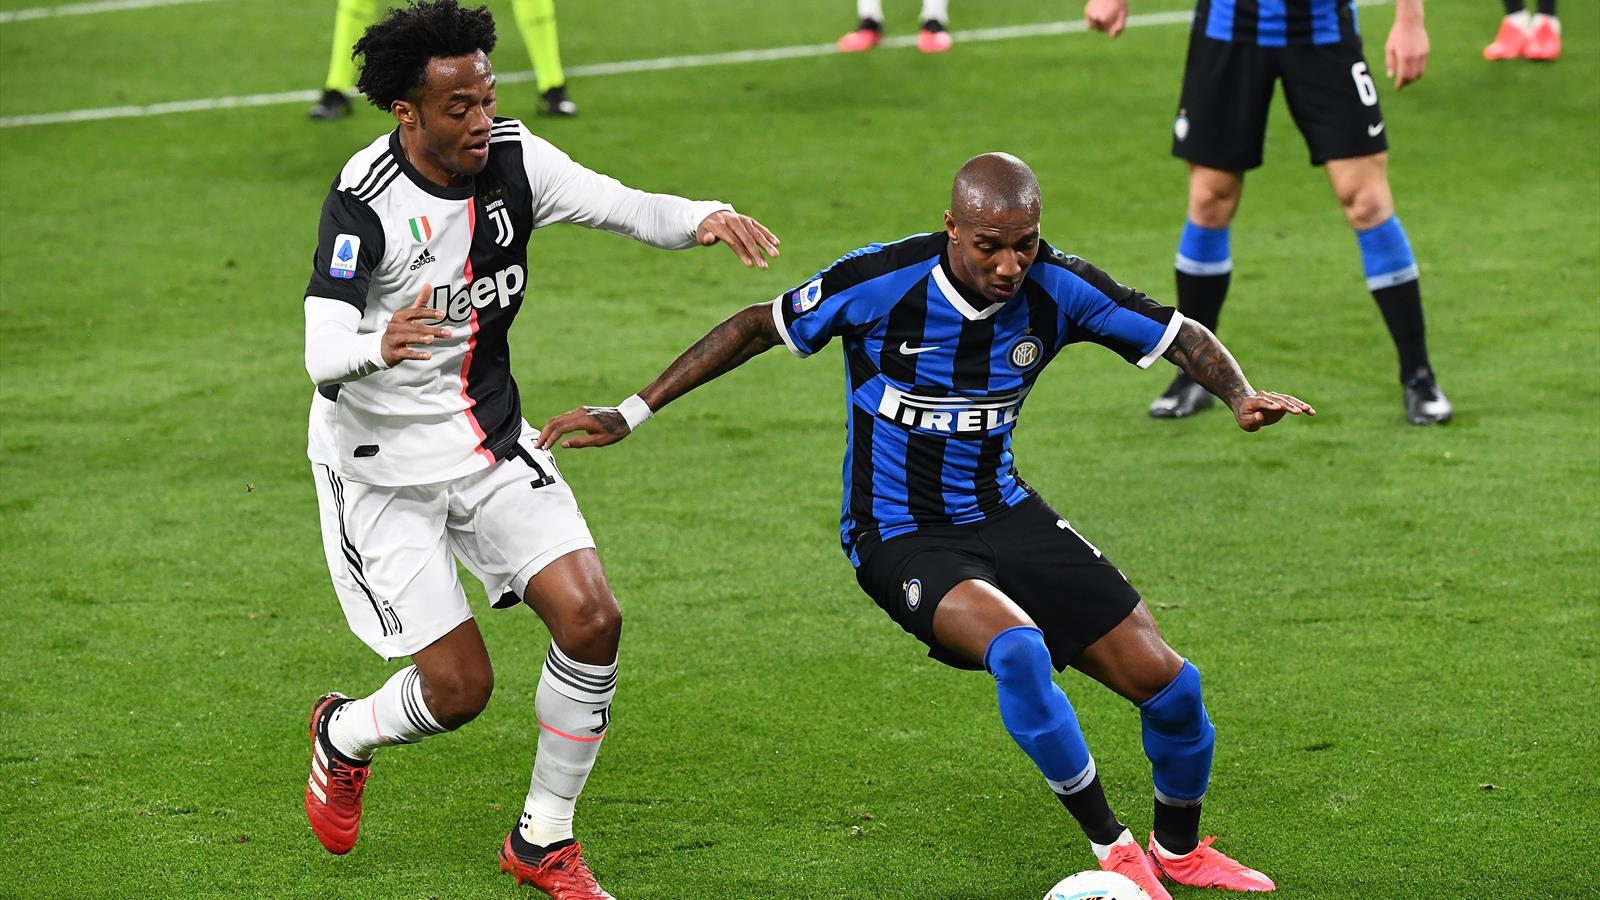 Juventus Inter In Diretta Tv E Live Streaming Serie A 2019 2020 Calcio Eurosport